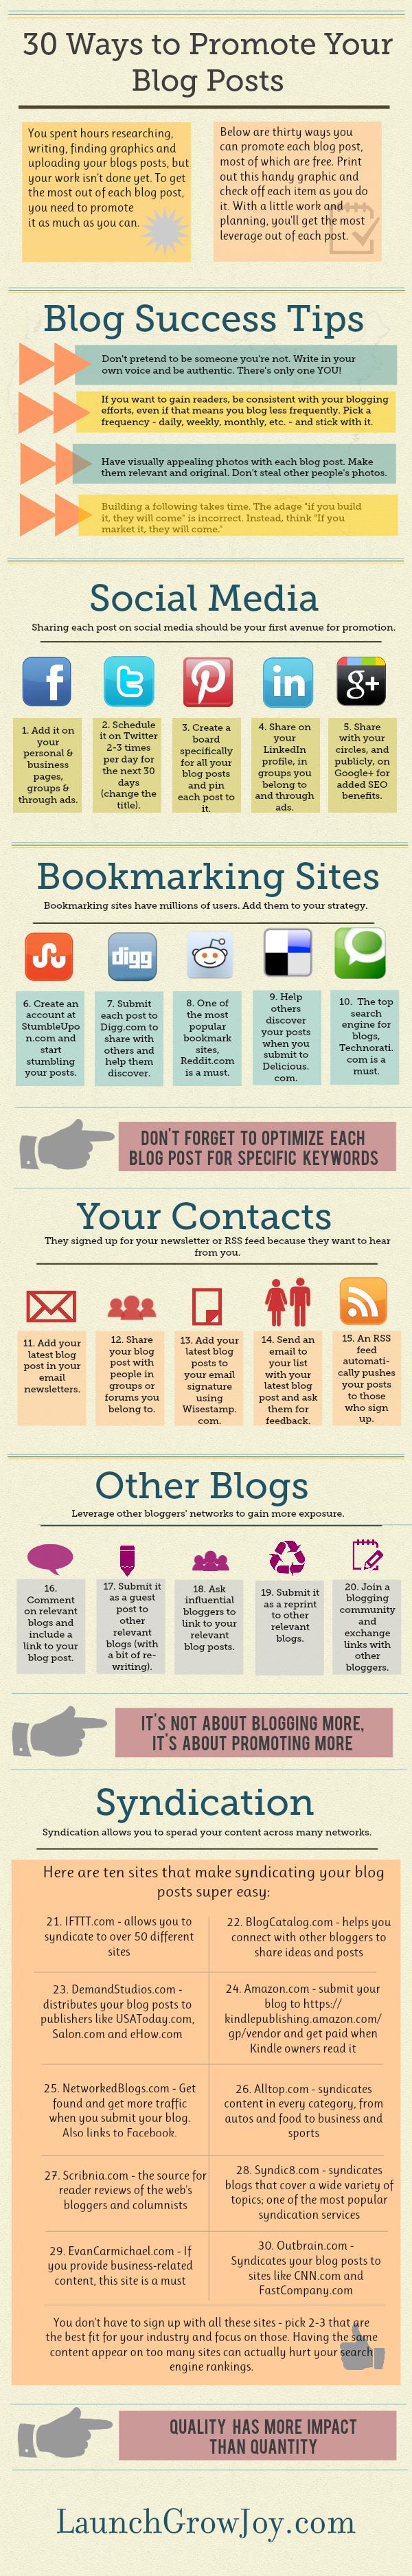 Market Your Blog Posts